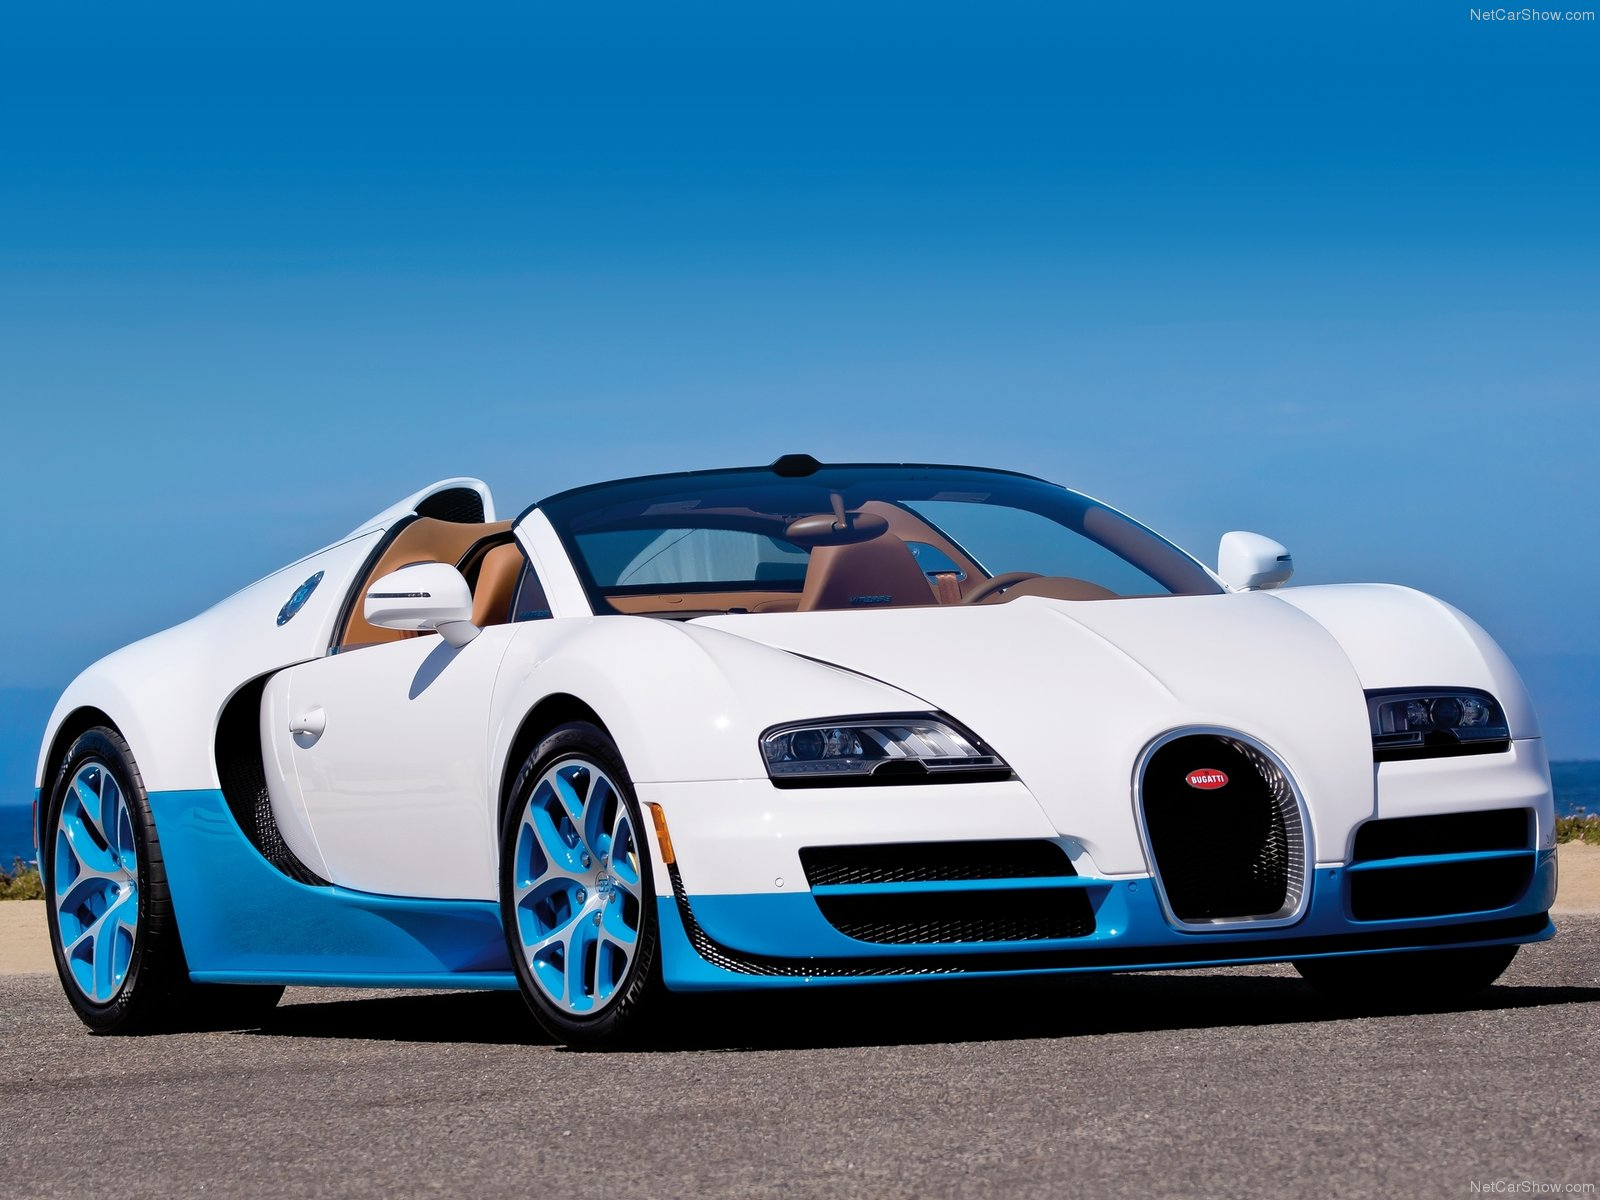 2012%2BBugatti%2BVeyron%2BGrand%2BSport%2BVitesse%2B%25283%2529 Astounding Xe Bugatti Veyron Grand Sport Vitesse Cars Trend